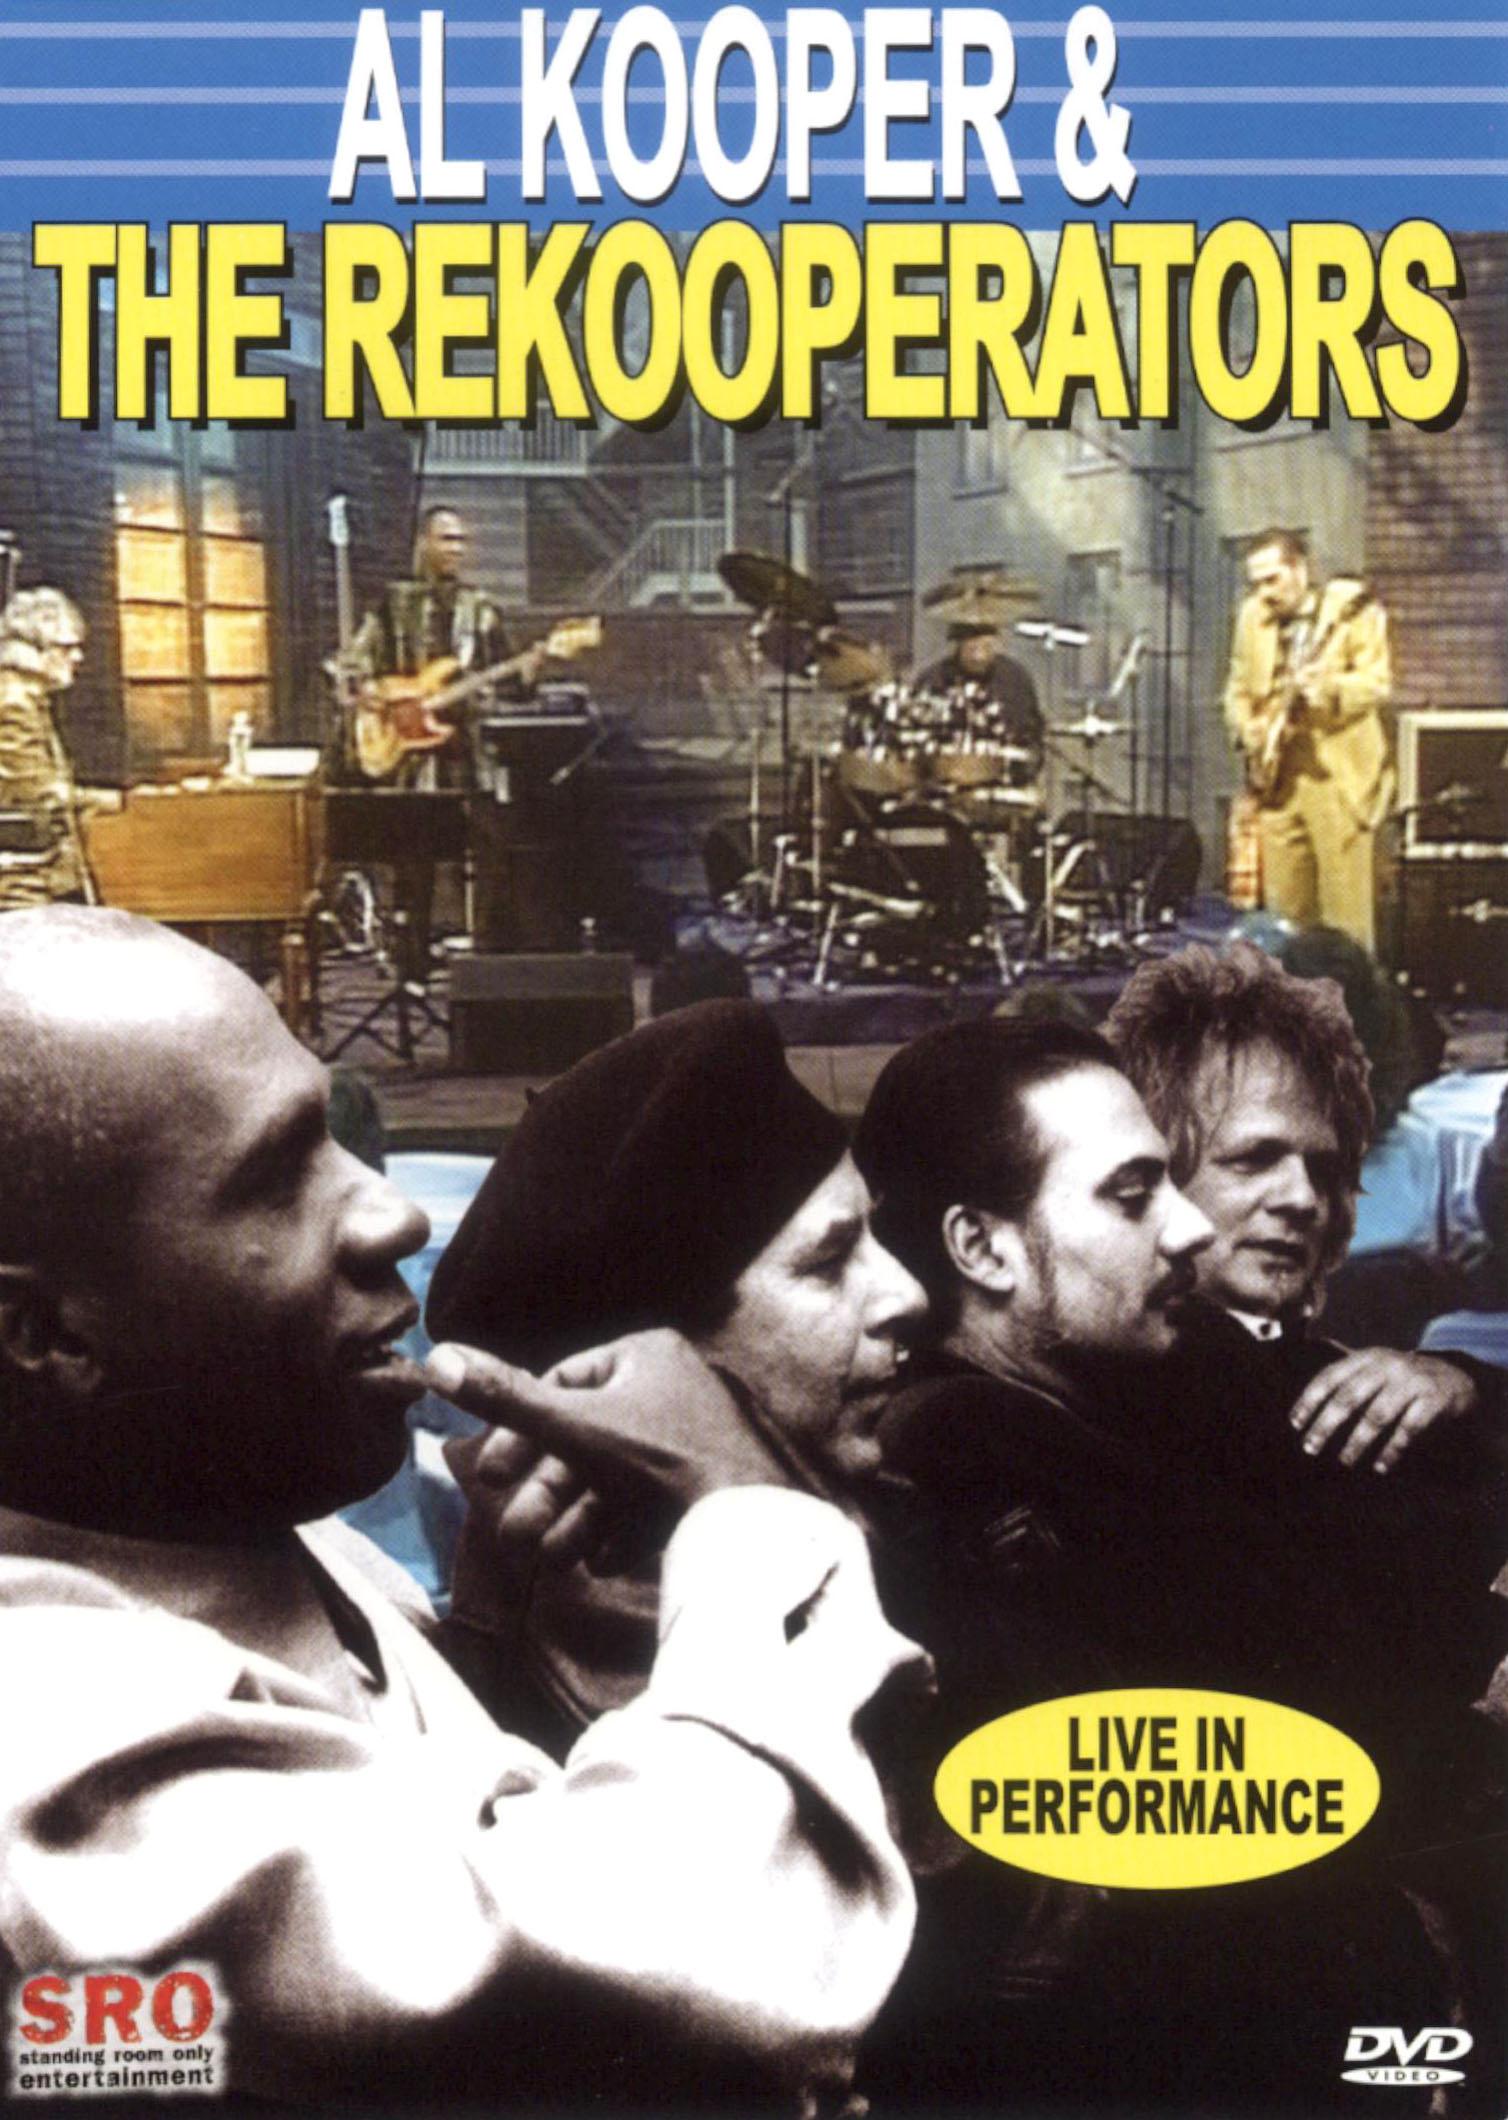 Al Kooper: Al Kooper and the Rekooperators